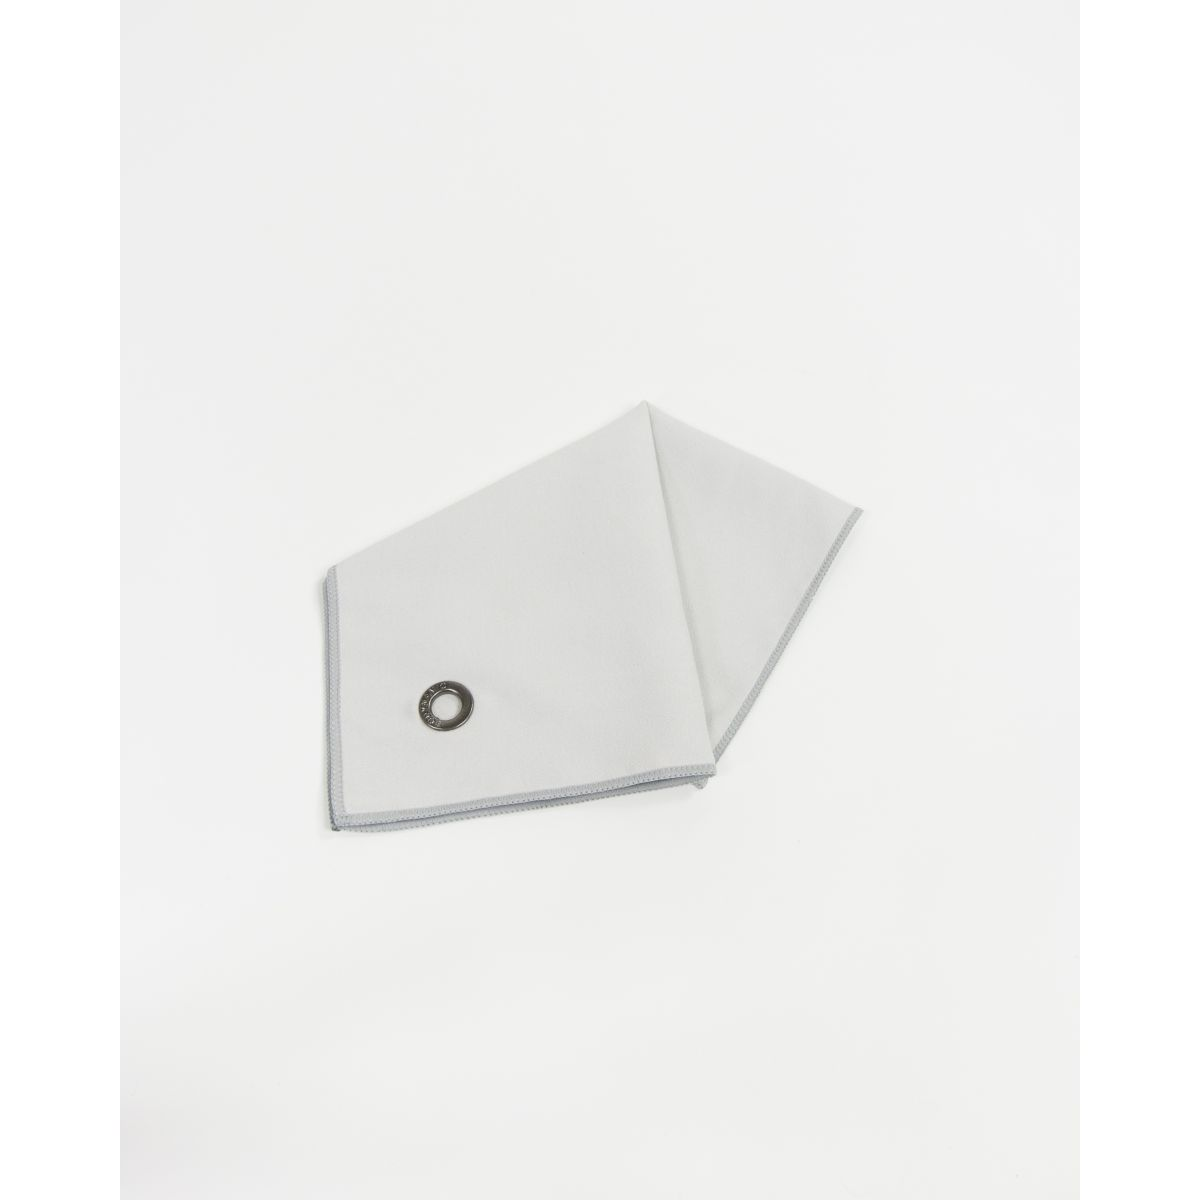 serviette mains visage en microfibre heiata gris perle bodynamic. Black Bedroom Furniture Sets. Home Design Ideas